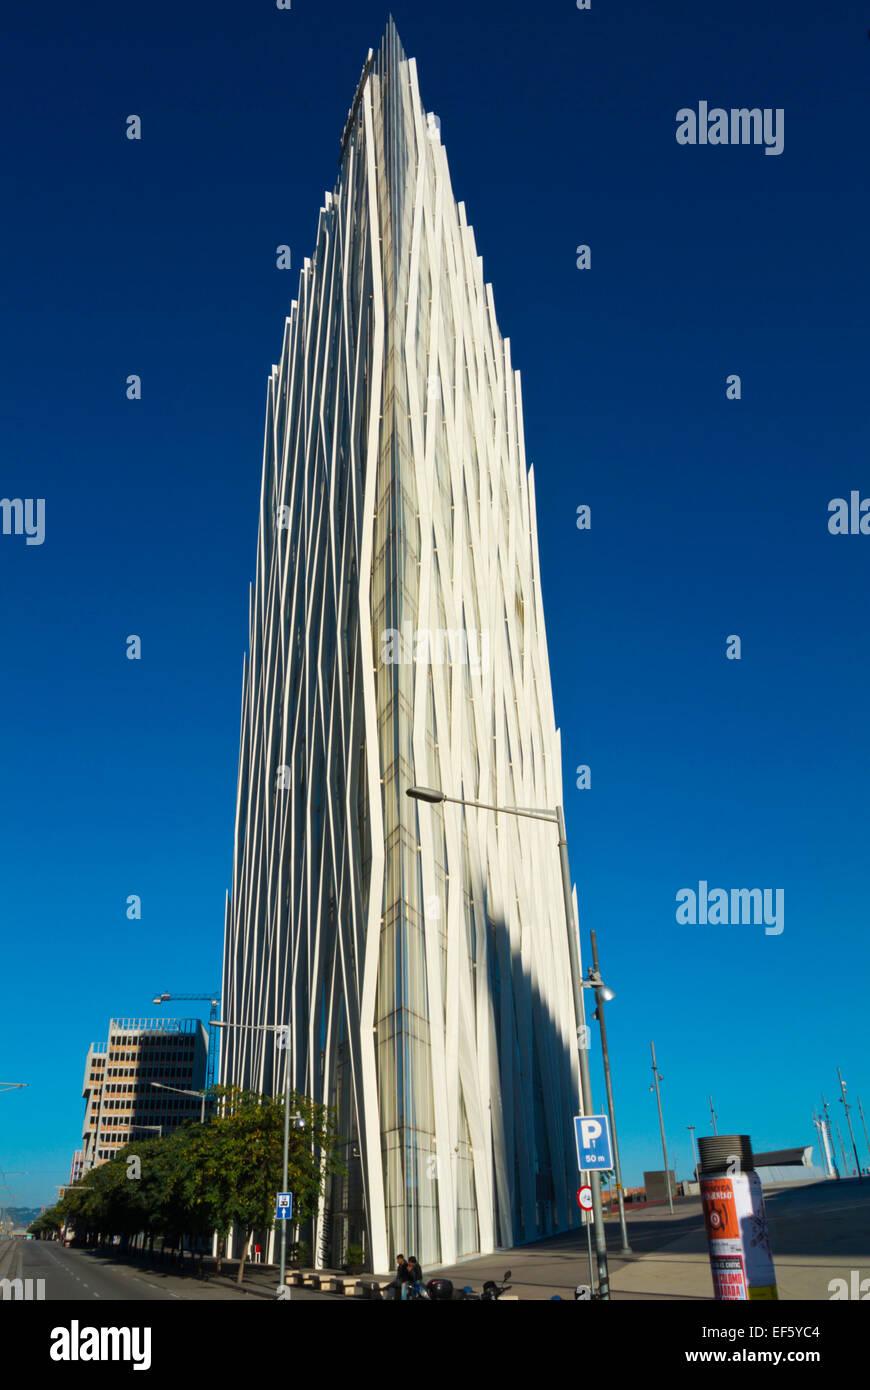 Torre Diagonal Zero Zero building, Forum area, Diagonal Mar, Sant Marti district, Barcelona, Spain - Stock Image